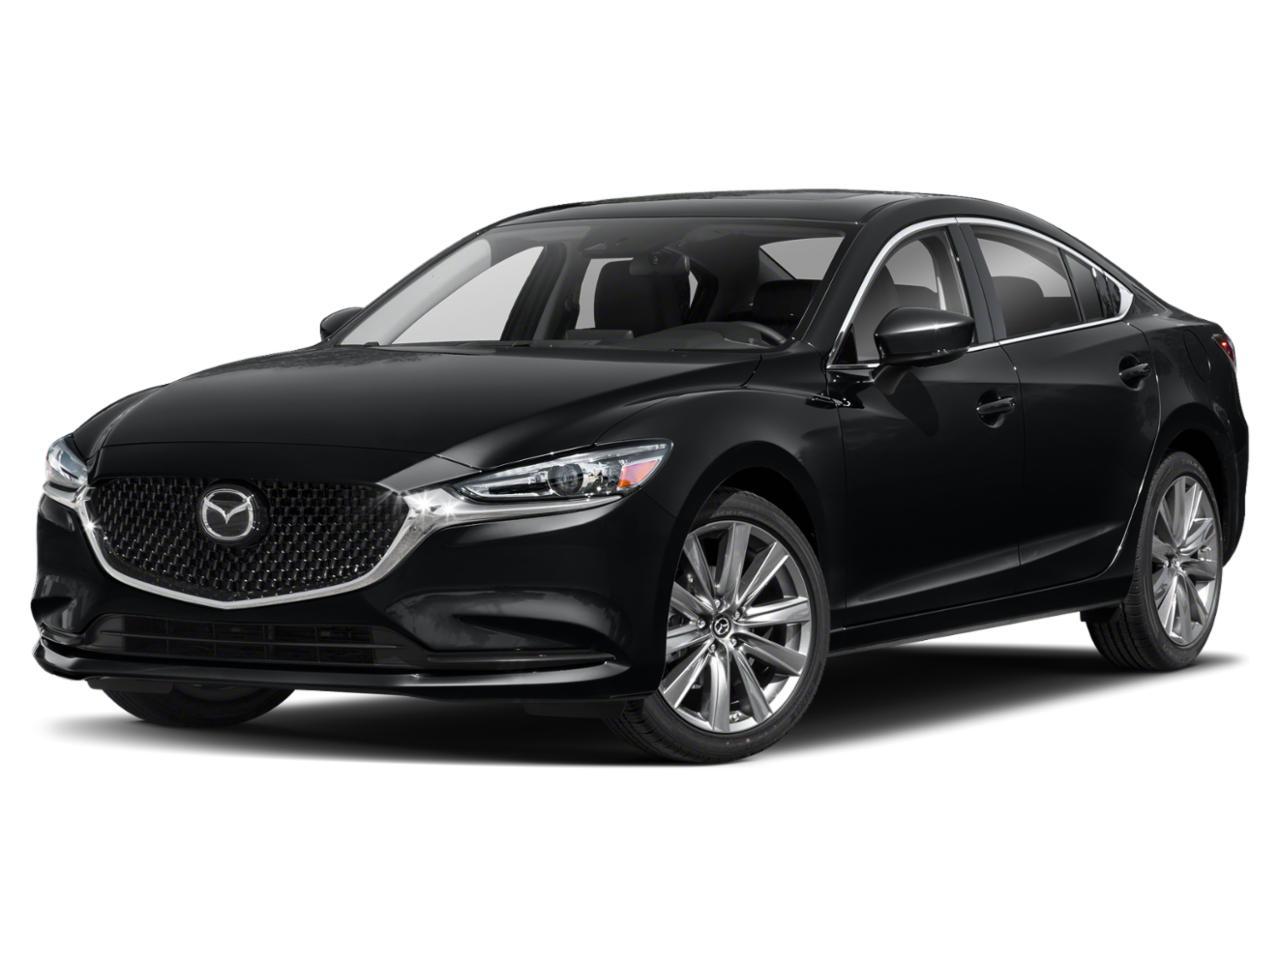 2020 Mazda Mazda6 Vehicle Photo in San Antonio, TX 78238